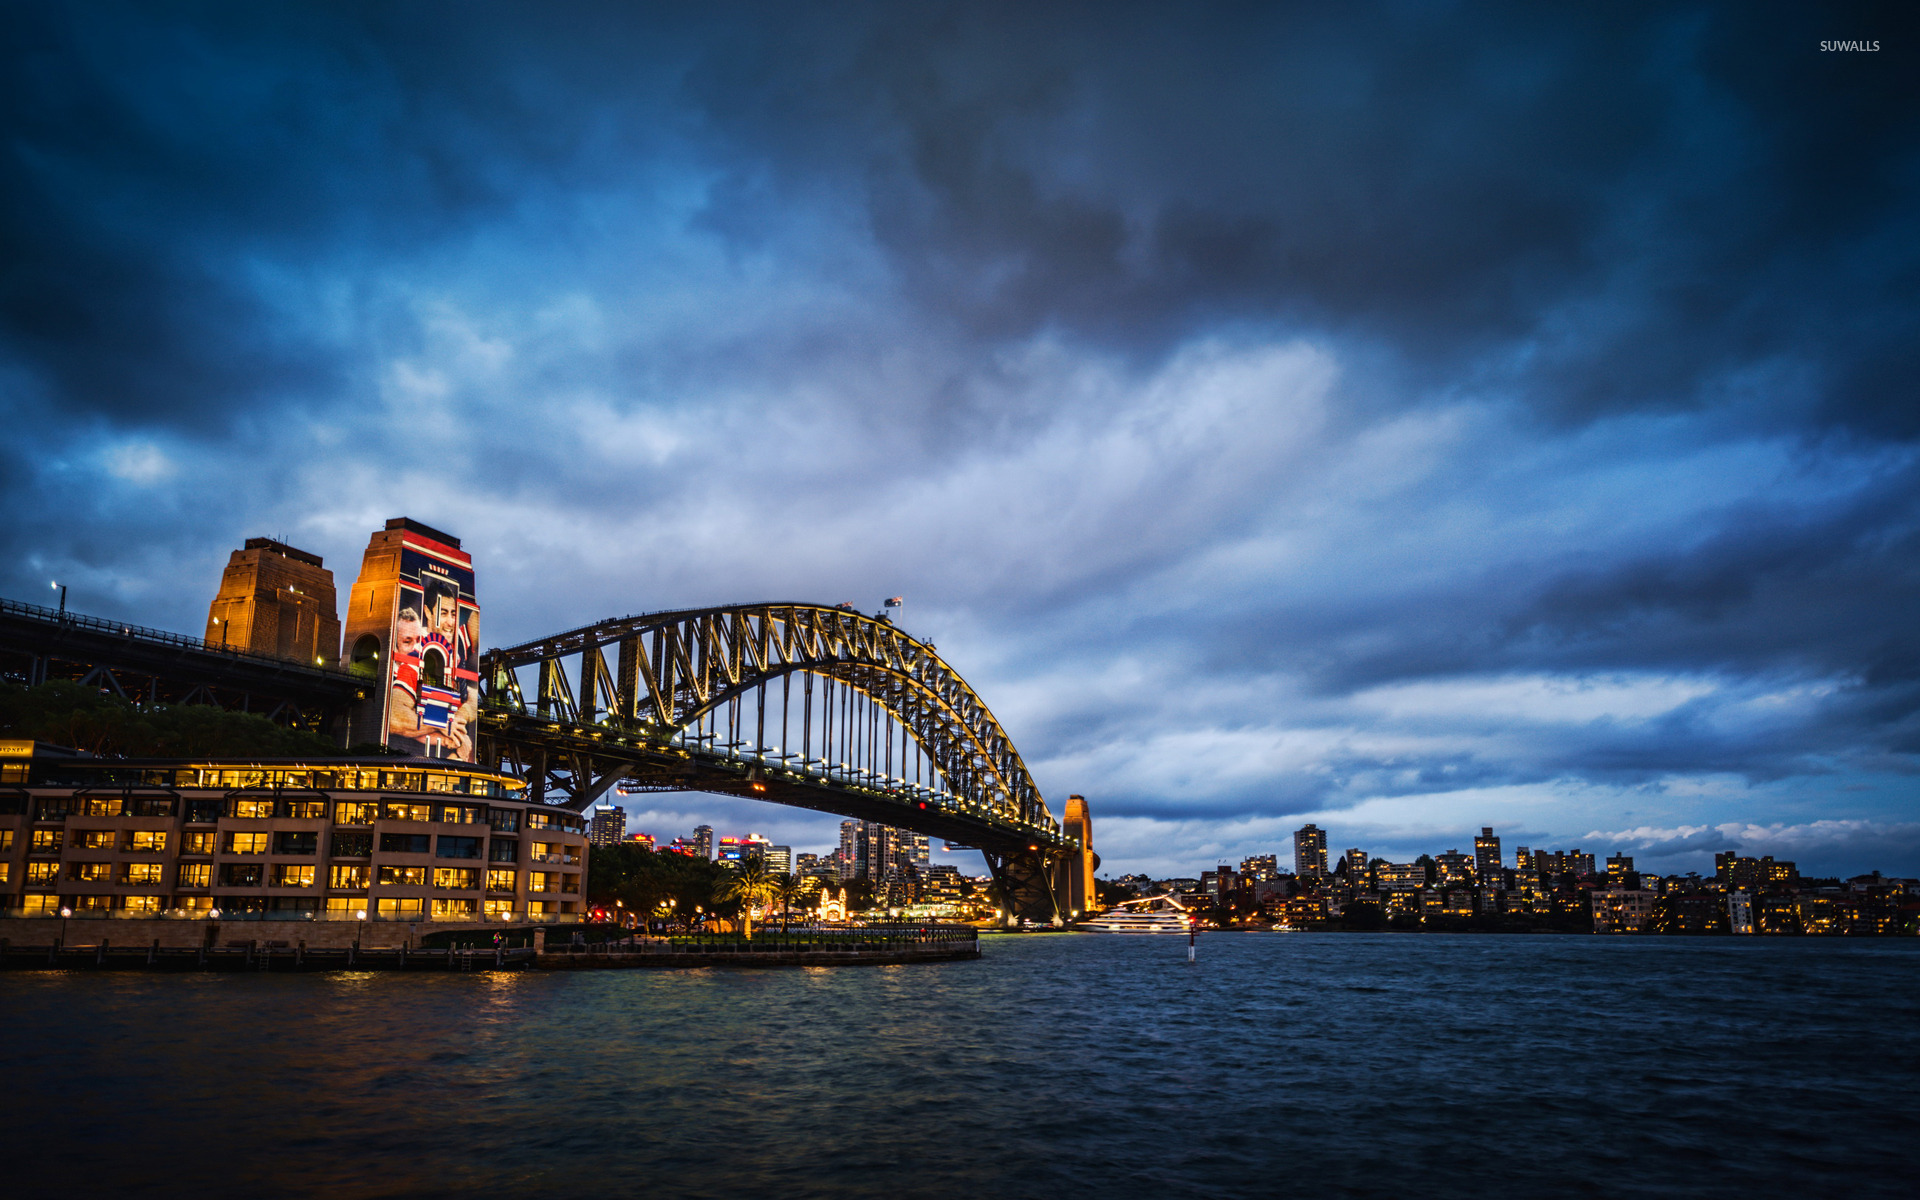 Sydney harbour bridge 3 wallpaper world wallpapers 26420 sydney harbour bridge 3 wallpaper altavistaventures Images